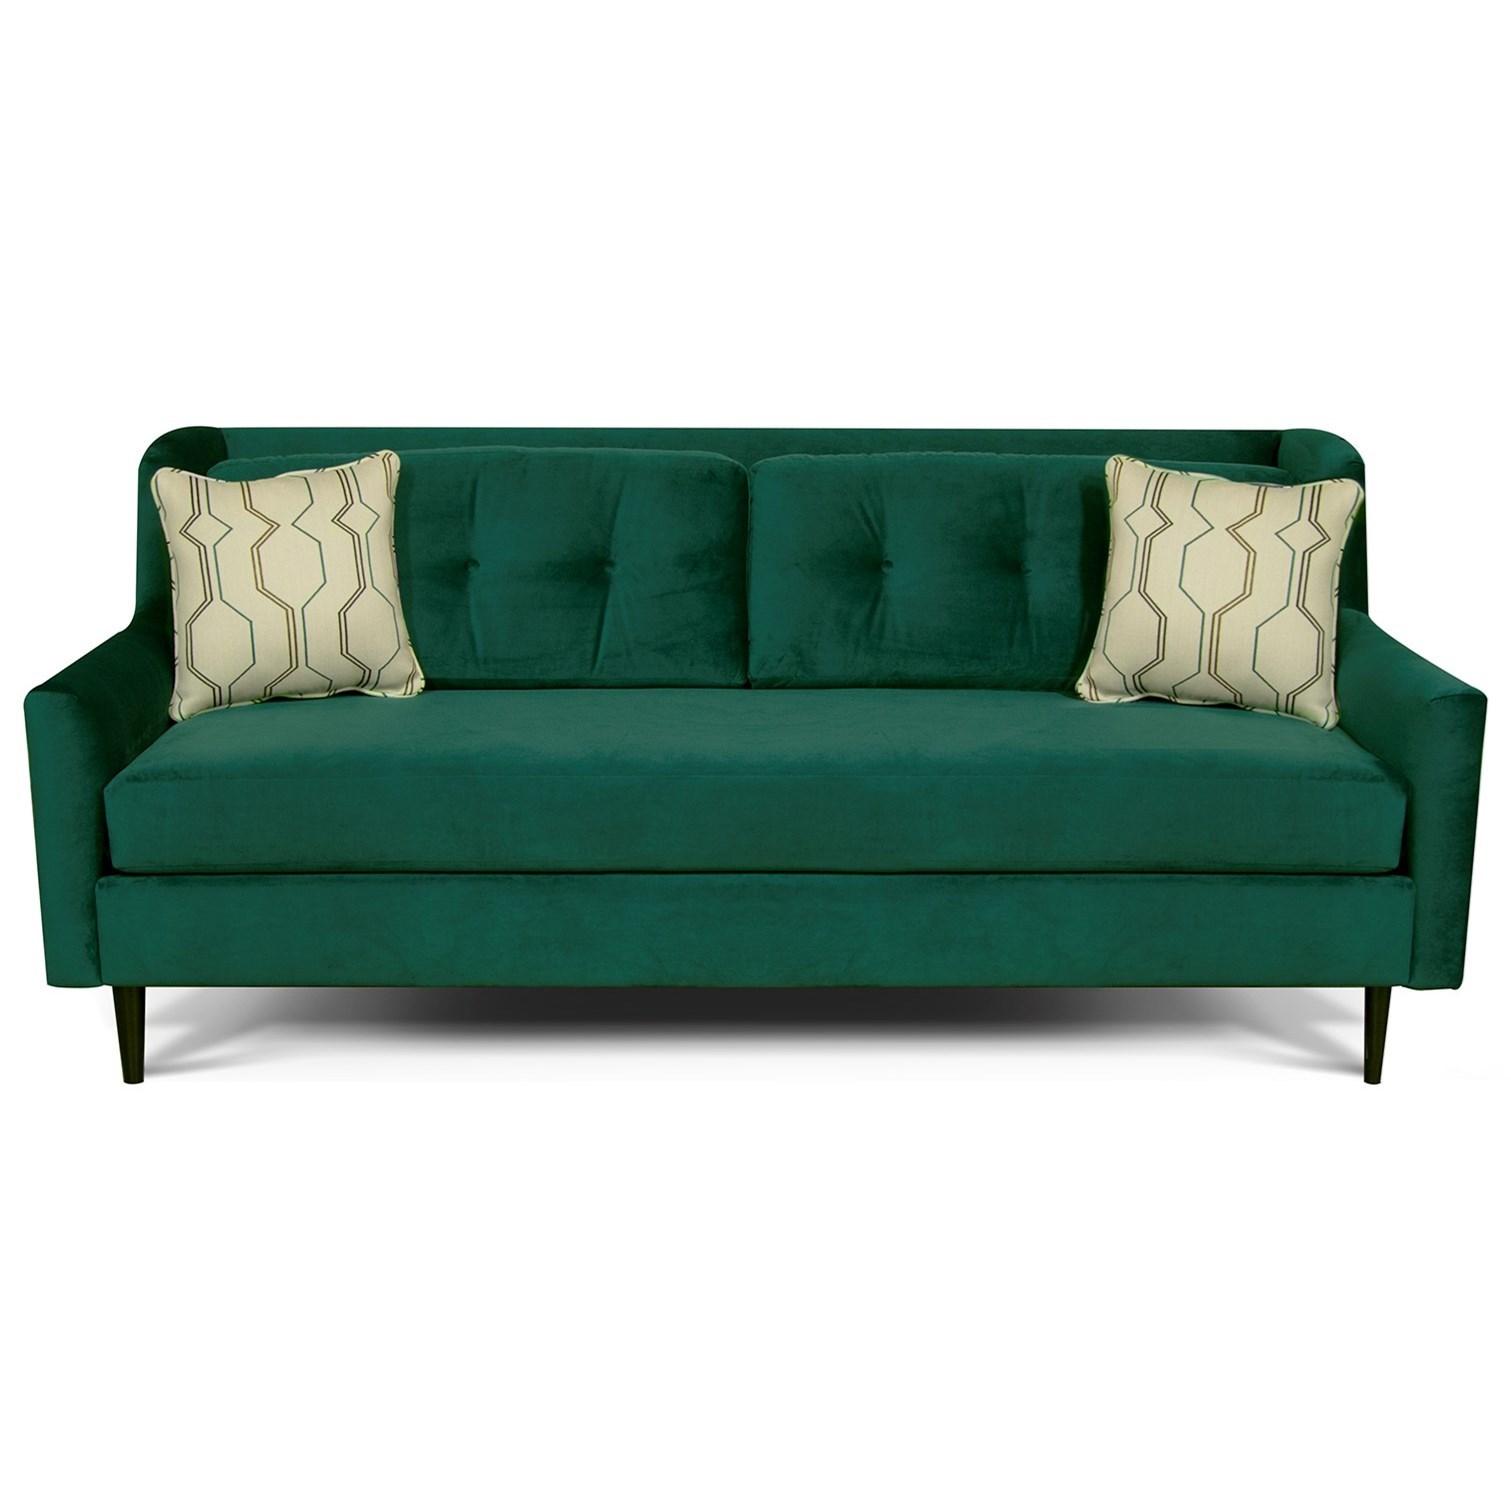 England Gramercy Park Sofa - Item Number: 5G05-Vette-Prussian